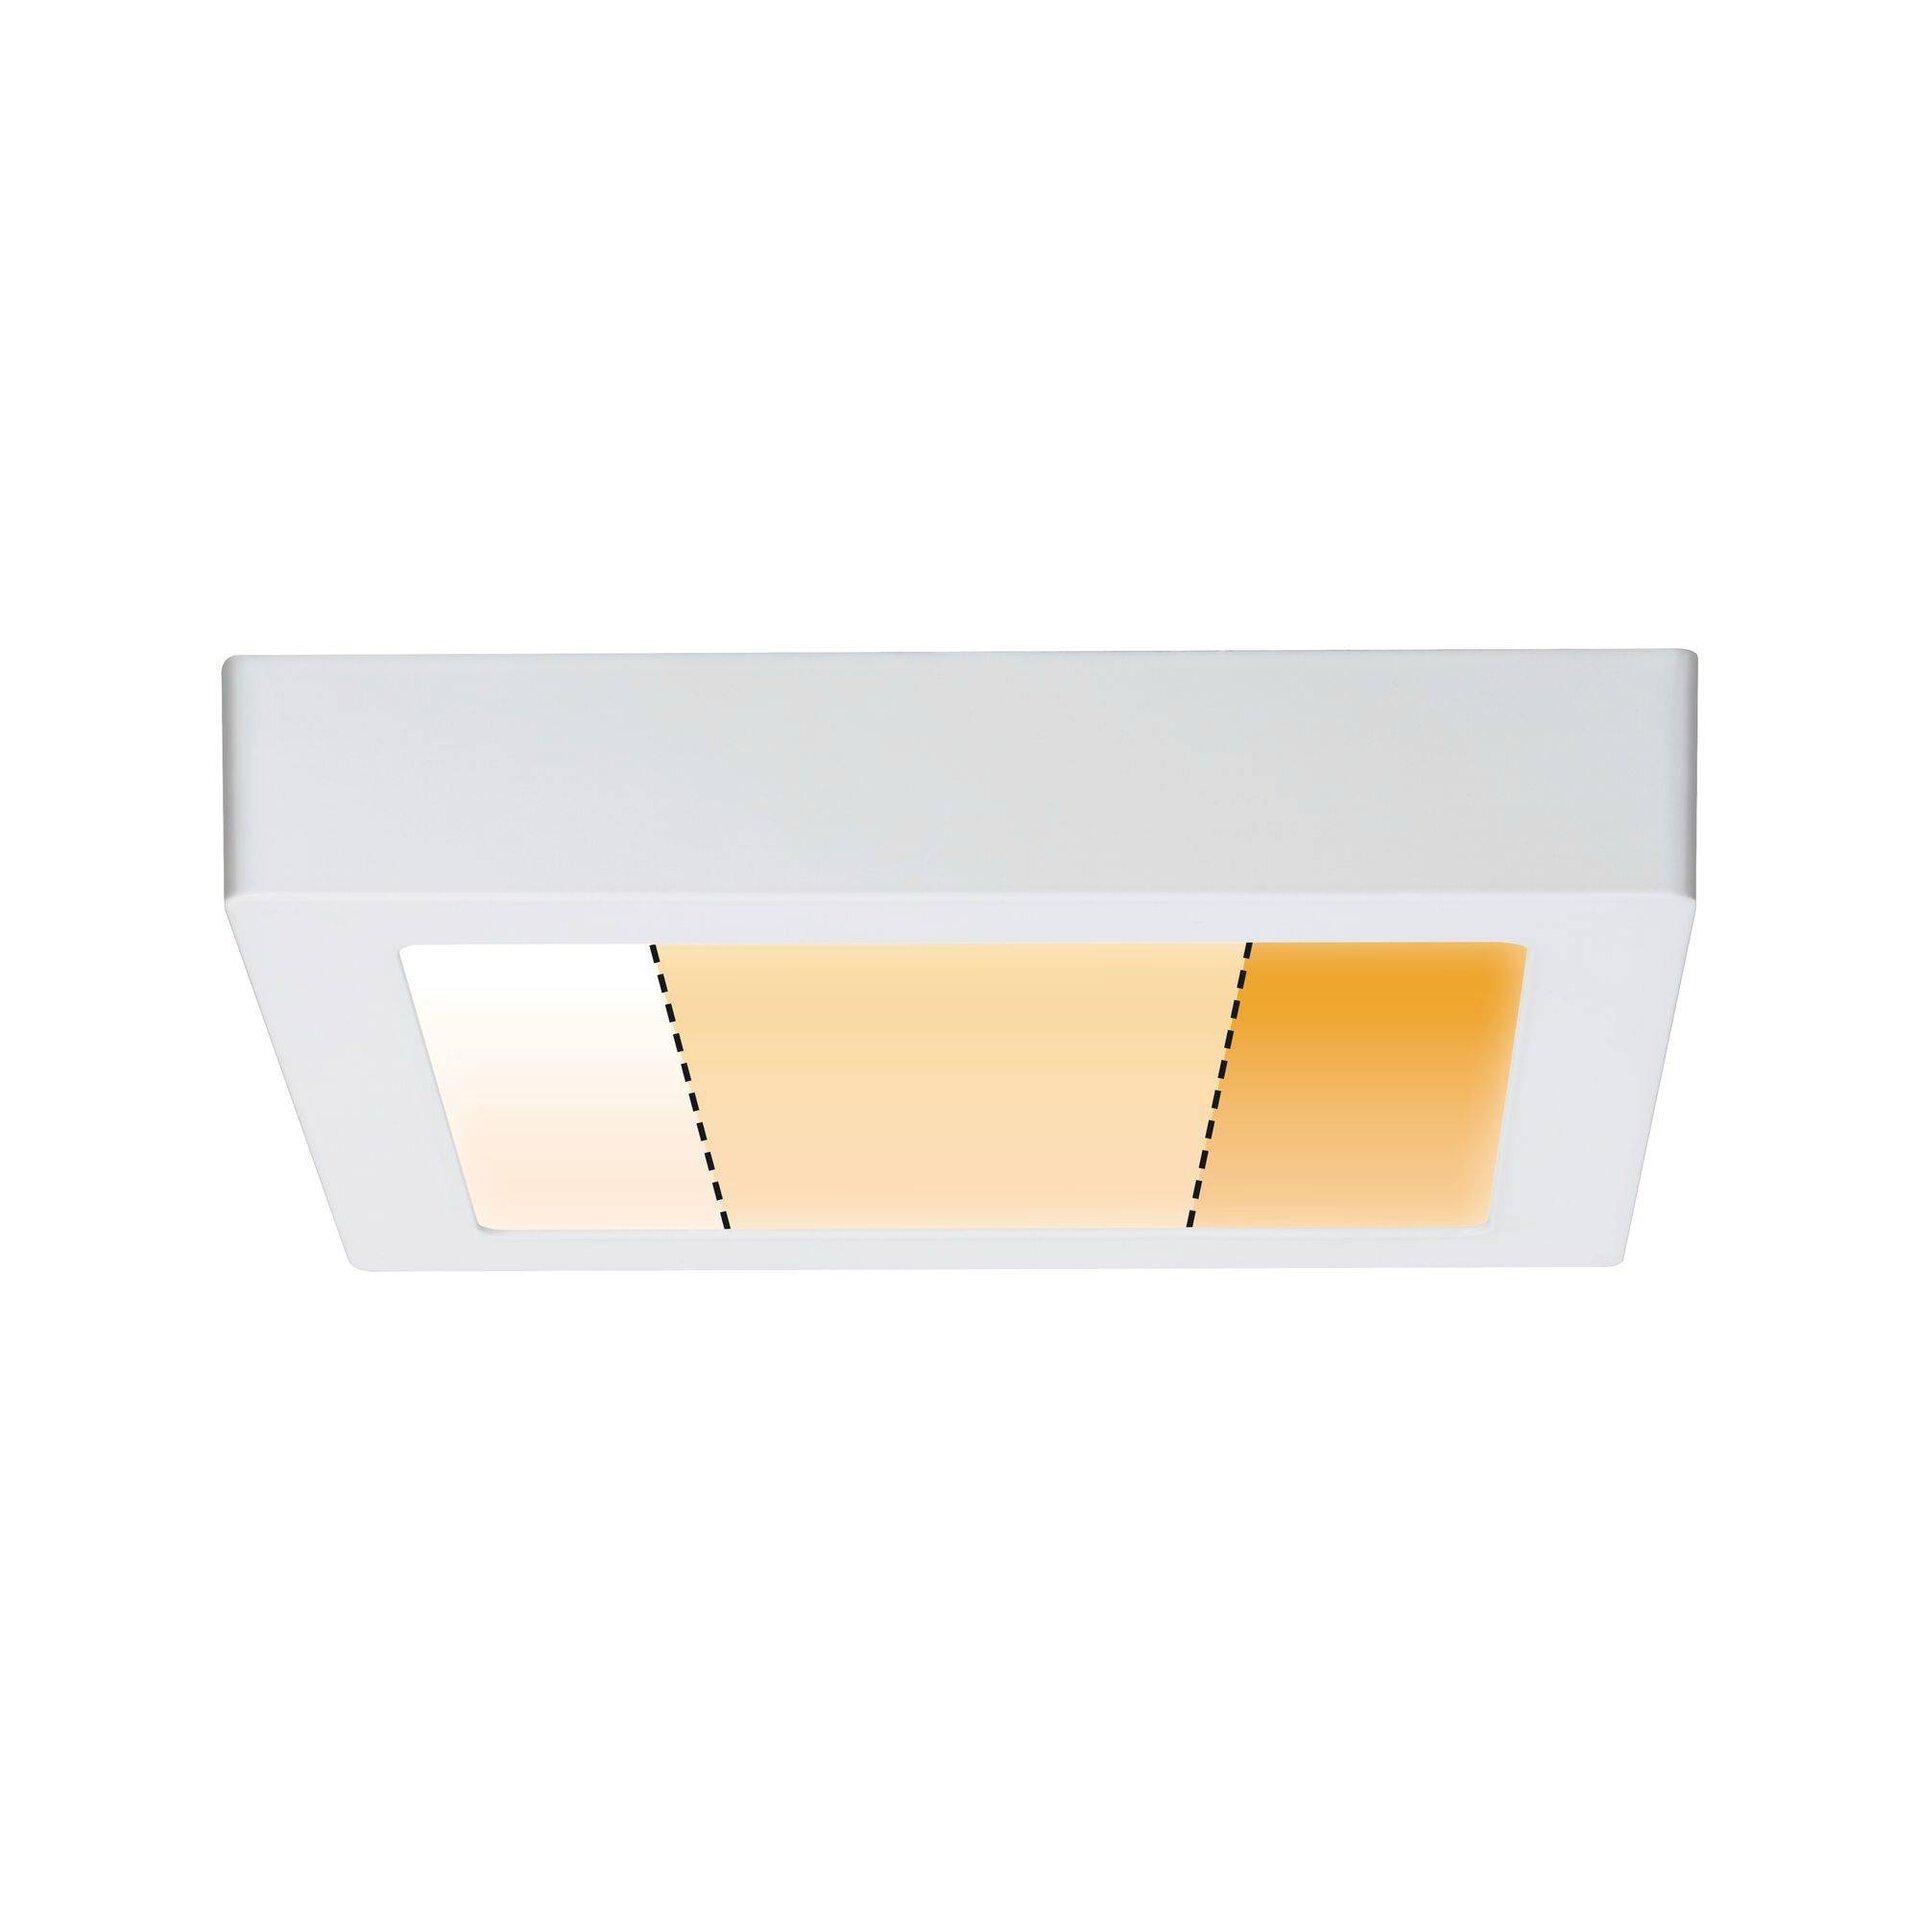 Panel Carpo Paulmann Metall weiß 23 x 4 x 23 cm